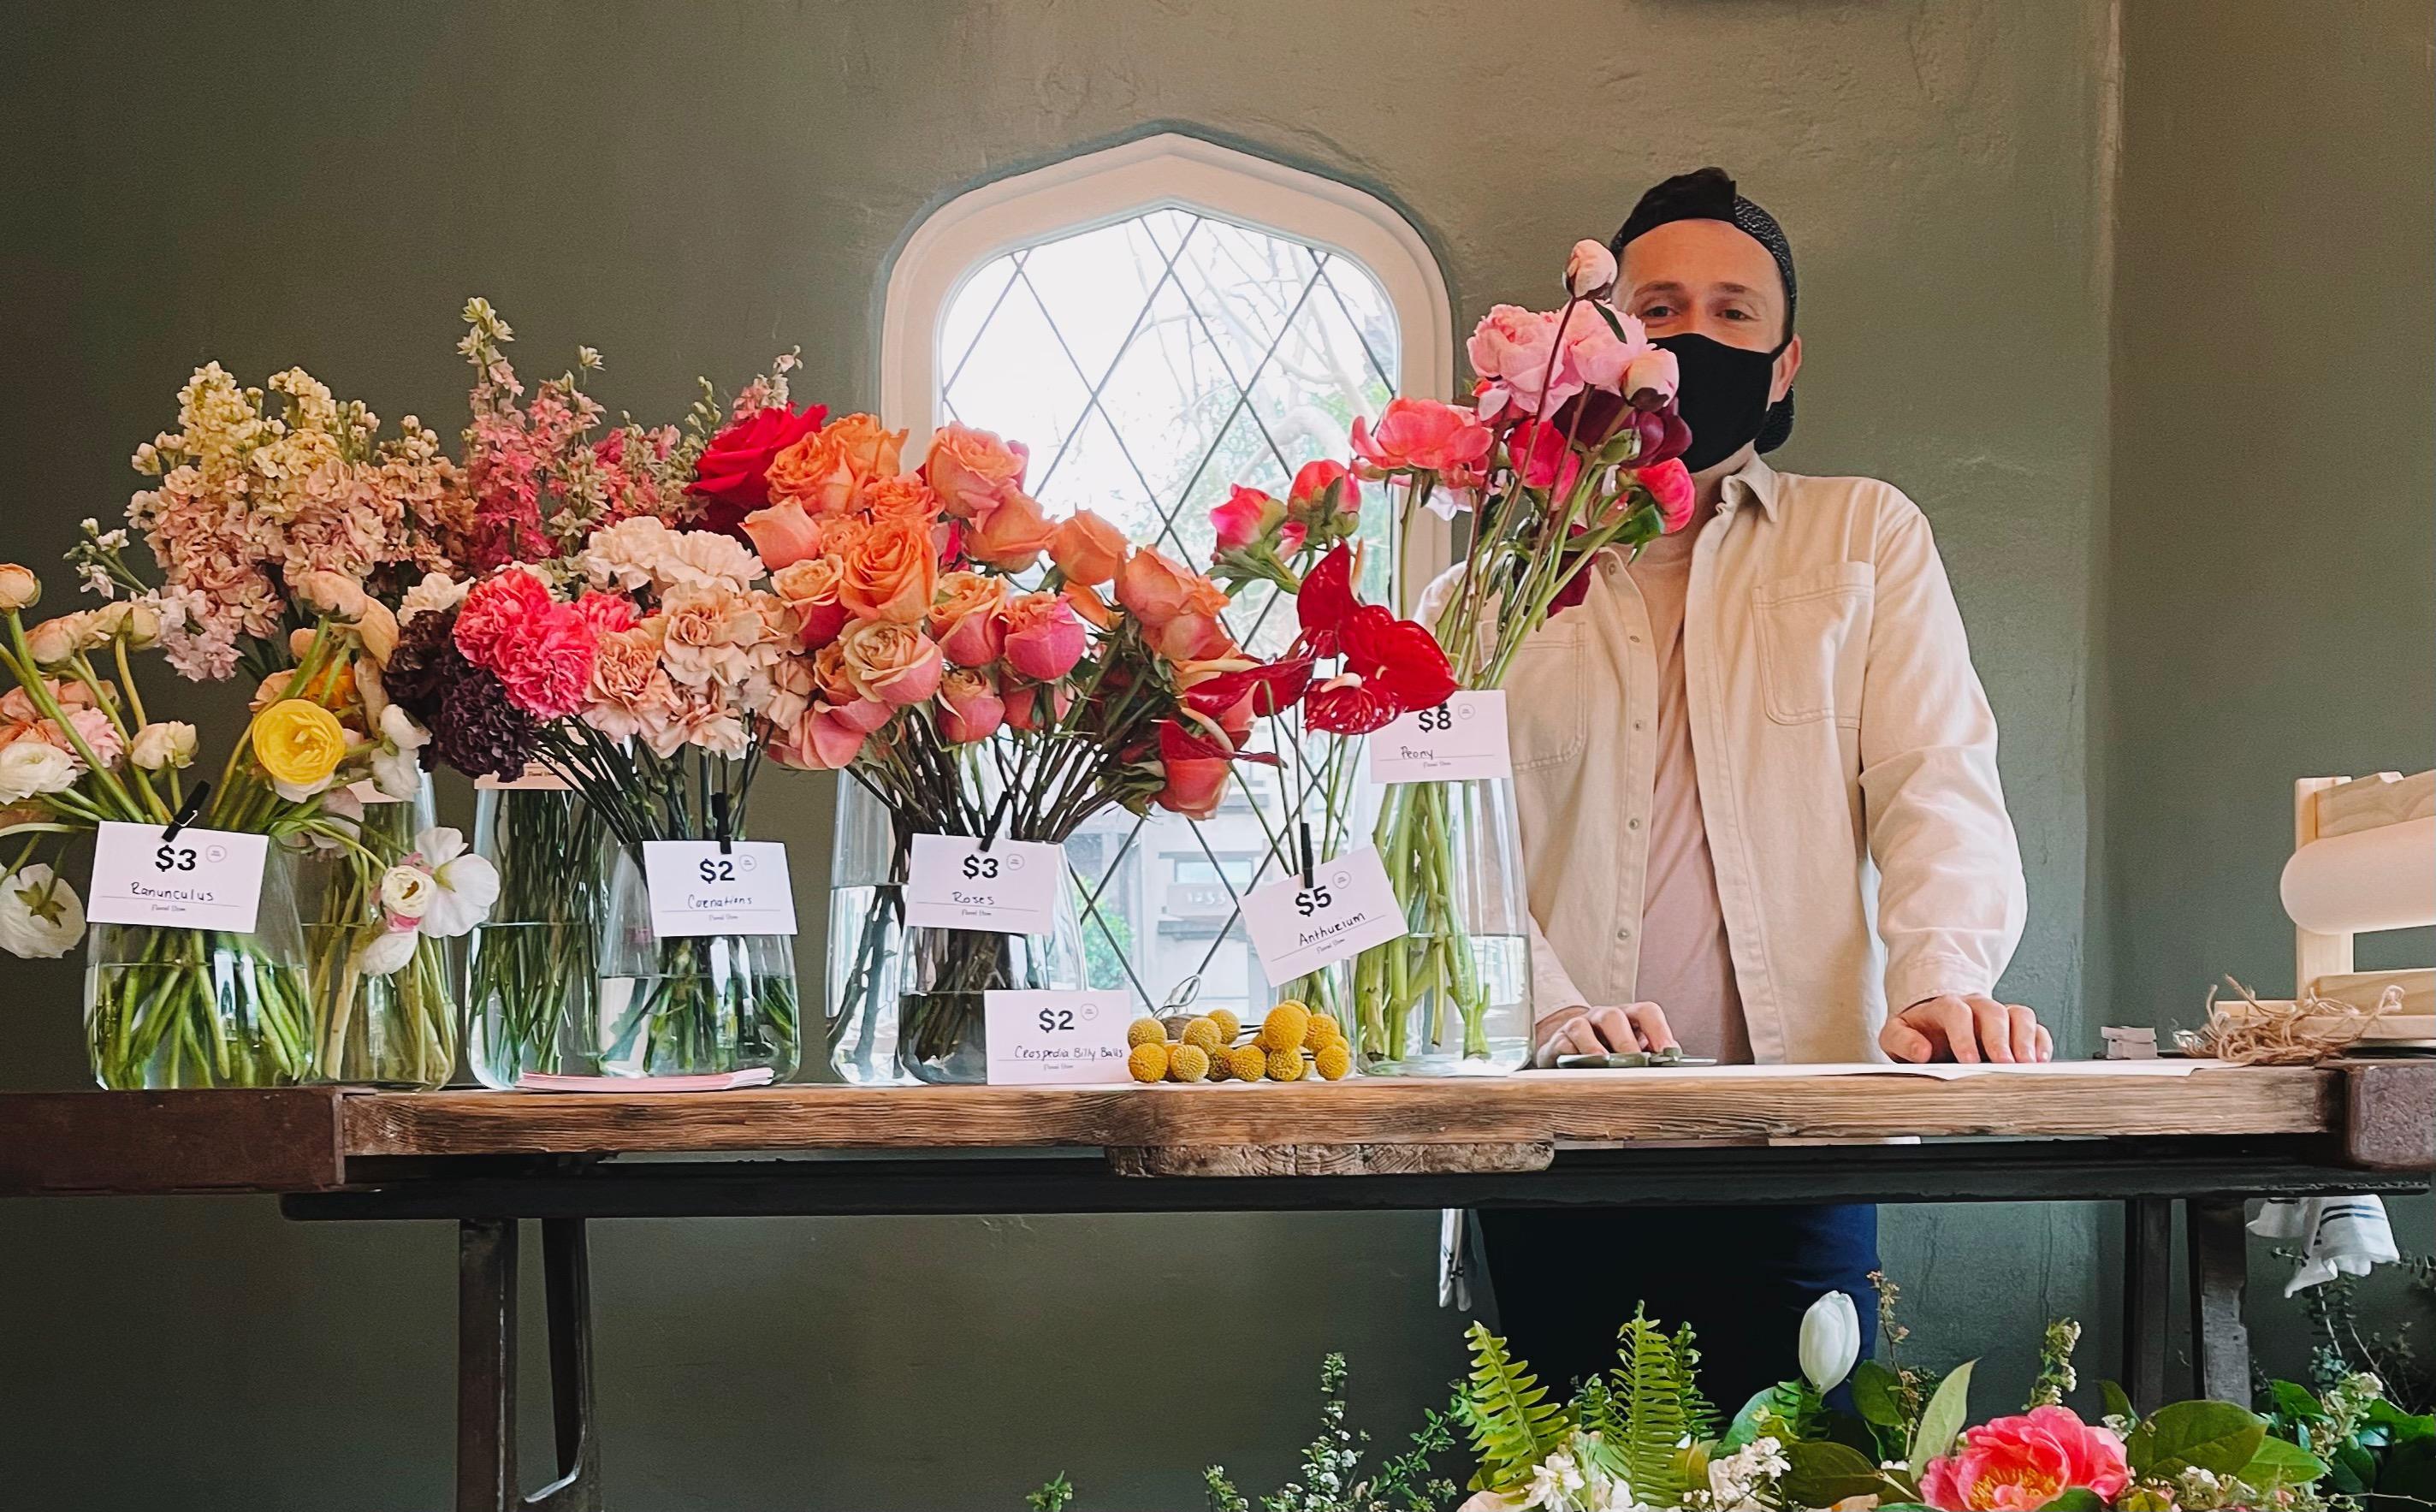 Faulks Floral Co Pop Up at Tartine Santa Monica